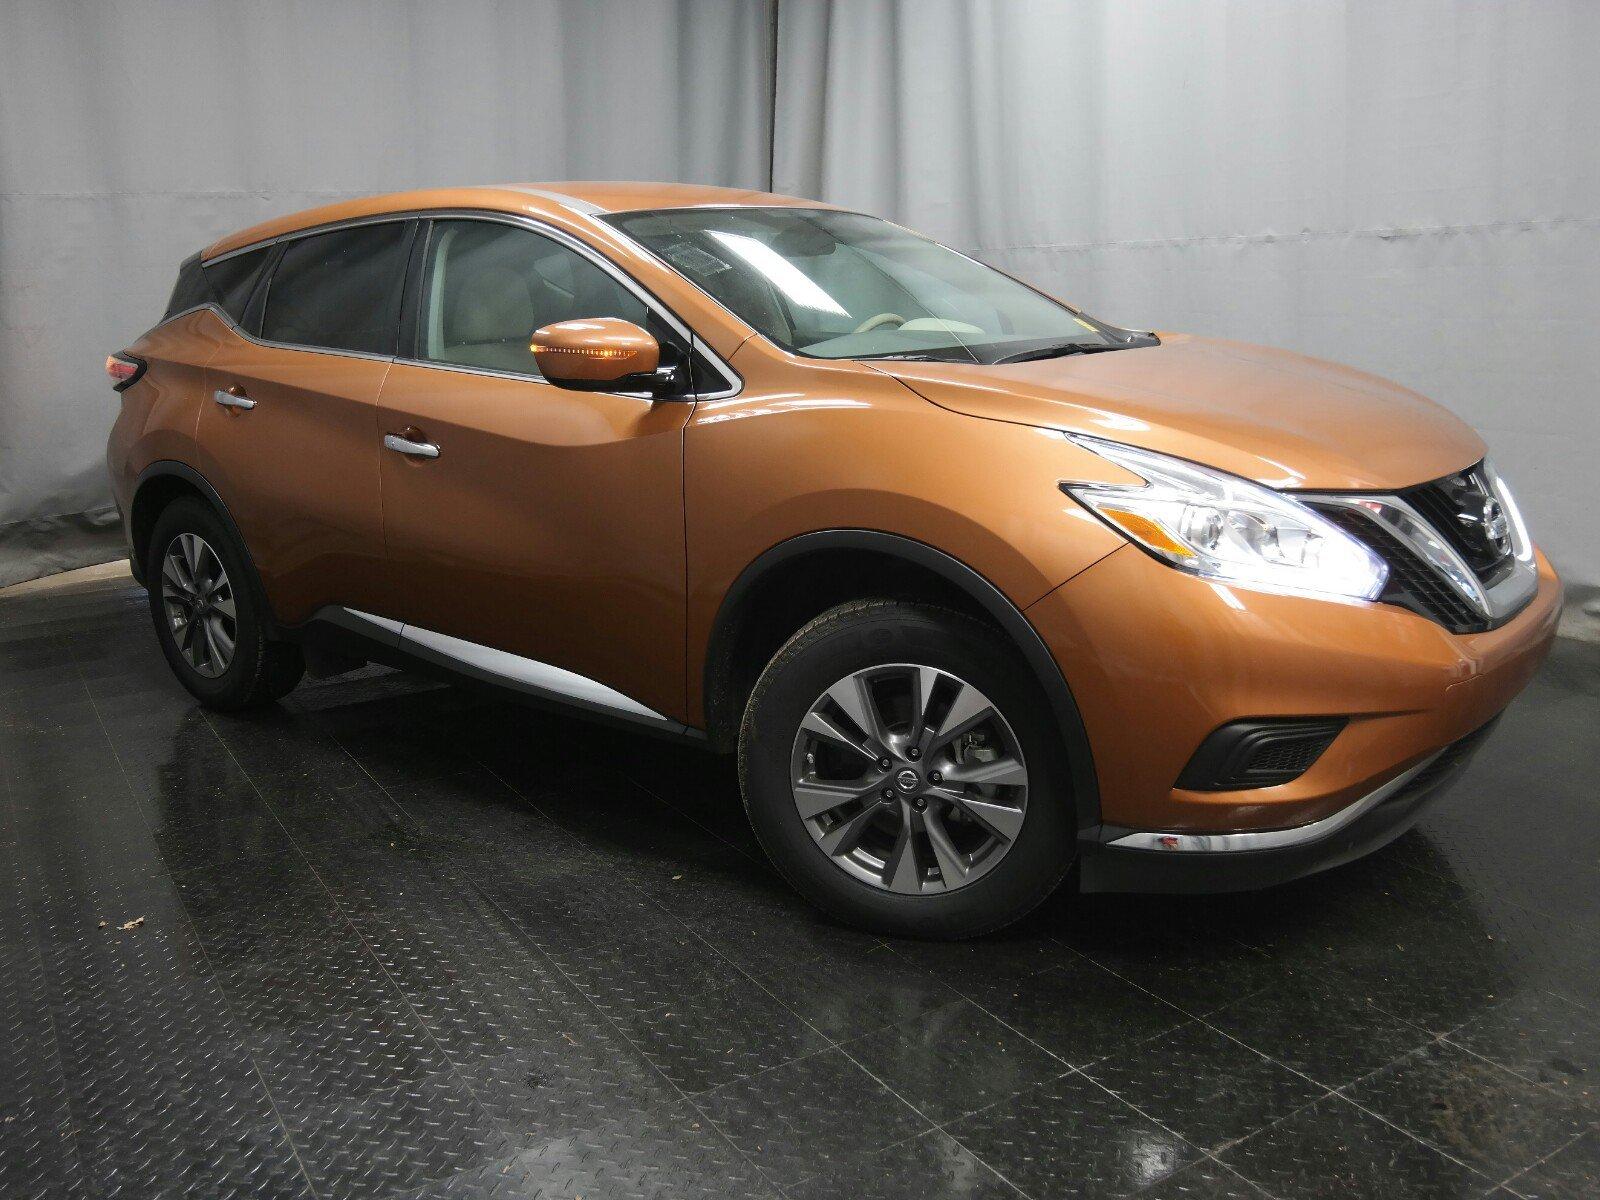 2017 Nissan Murano SV SUV Front-wheel Drive